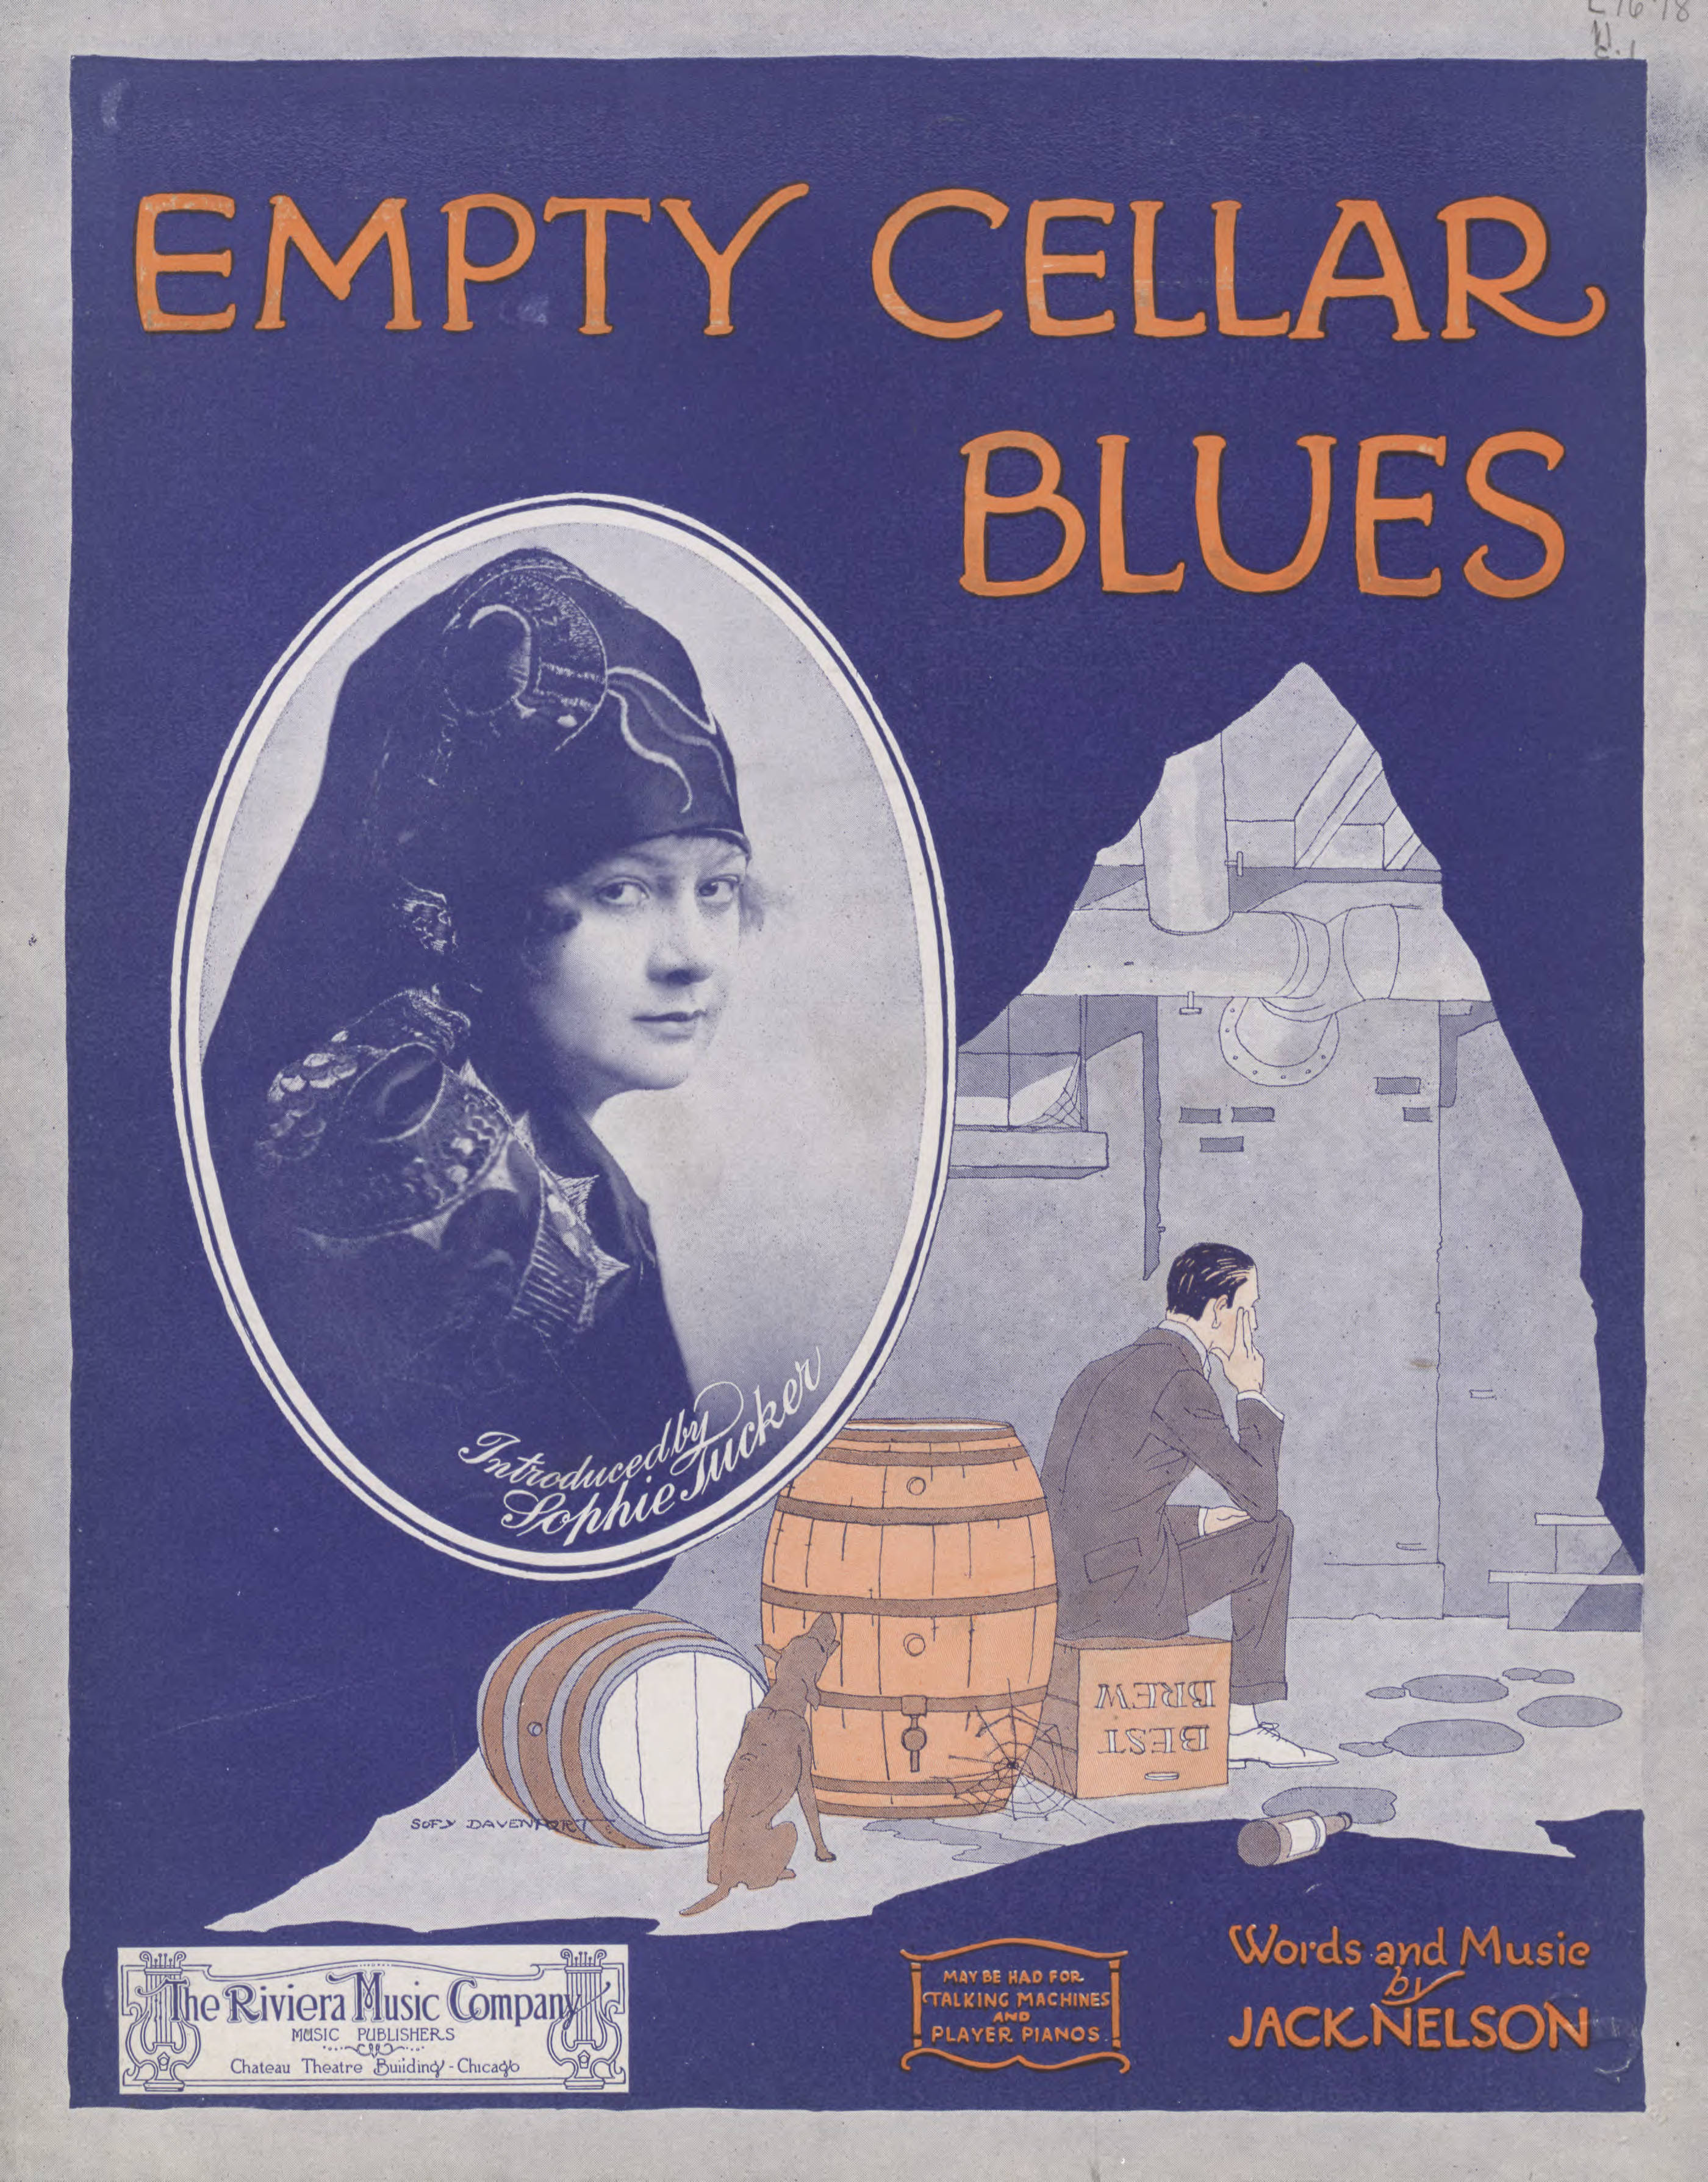 Baylor Univ Libraries_Empty cellar blues.jpg